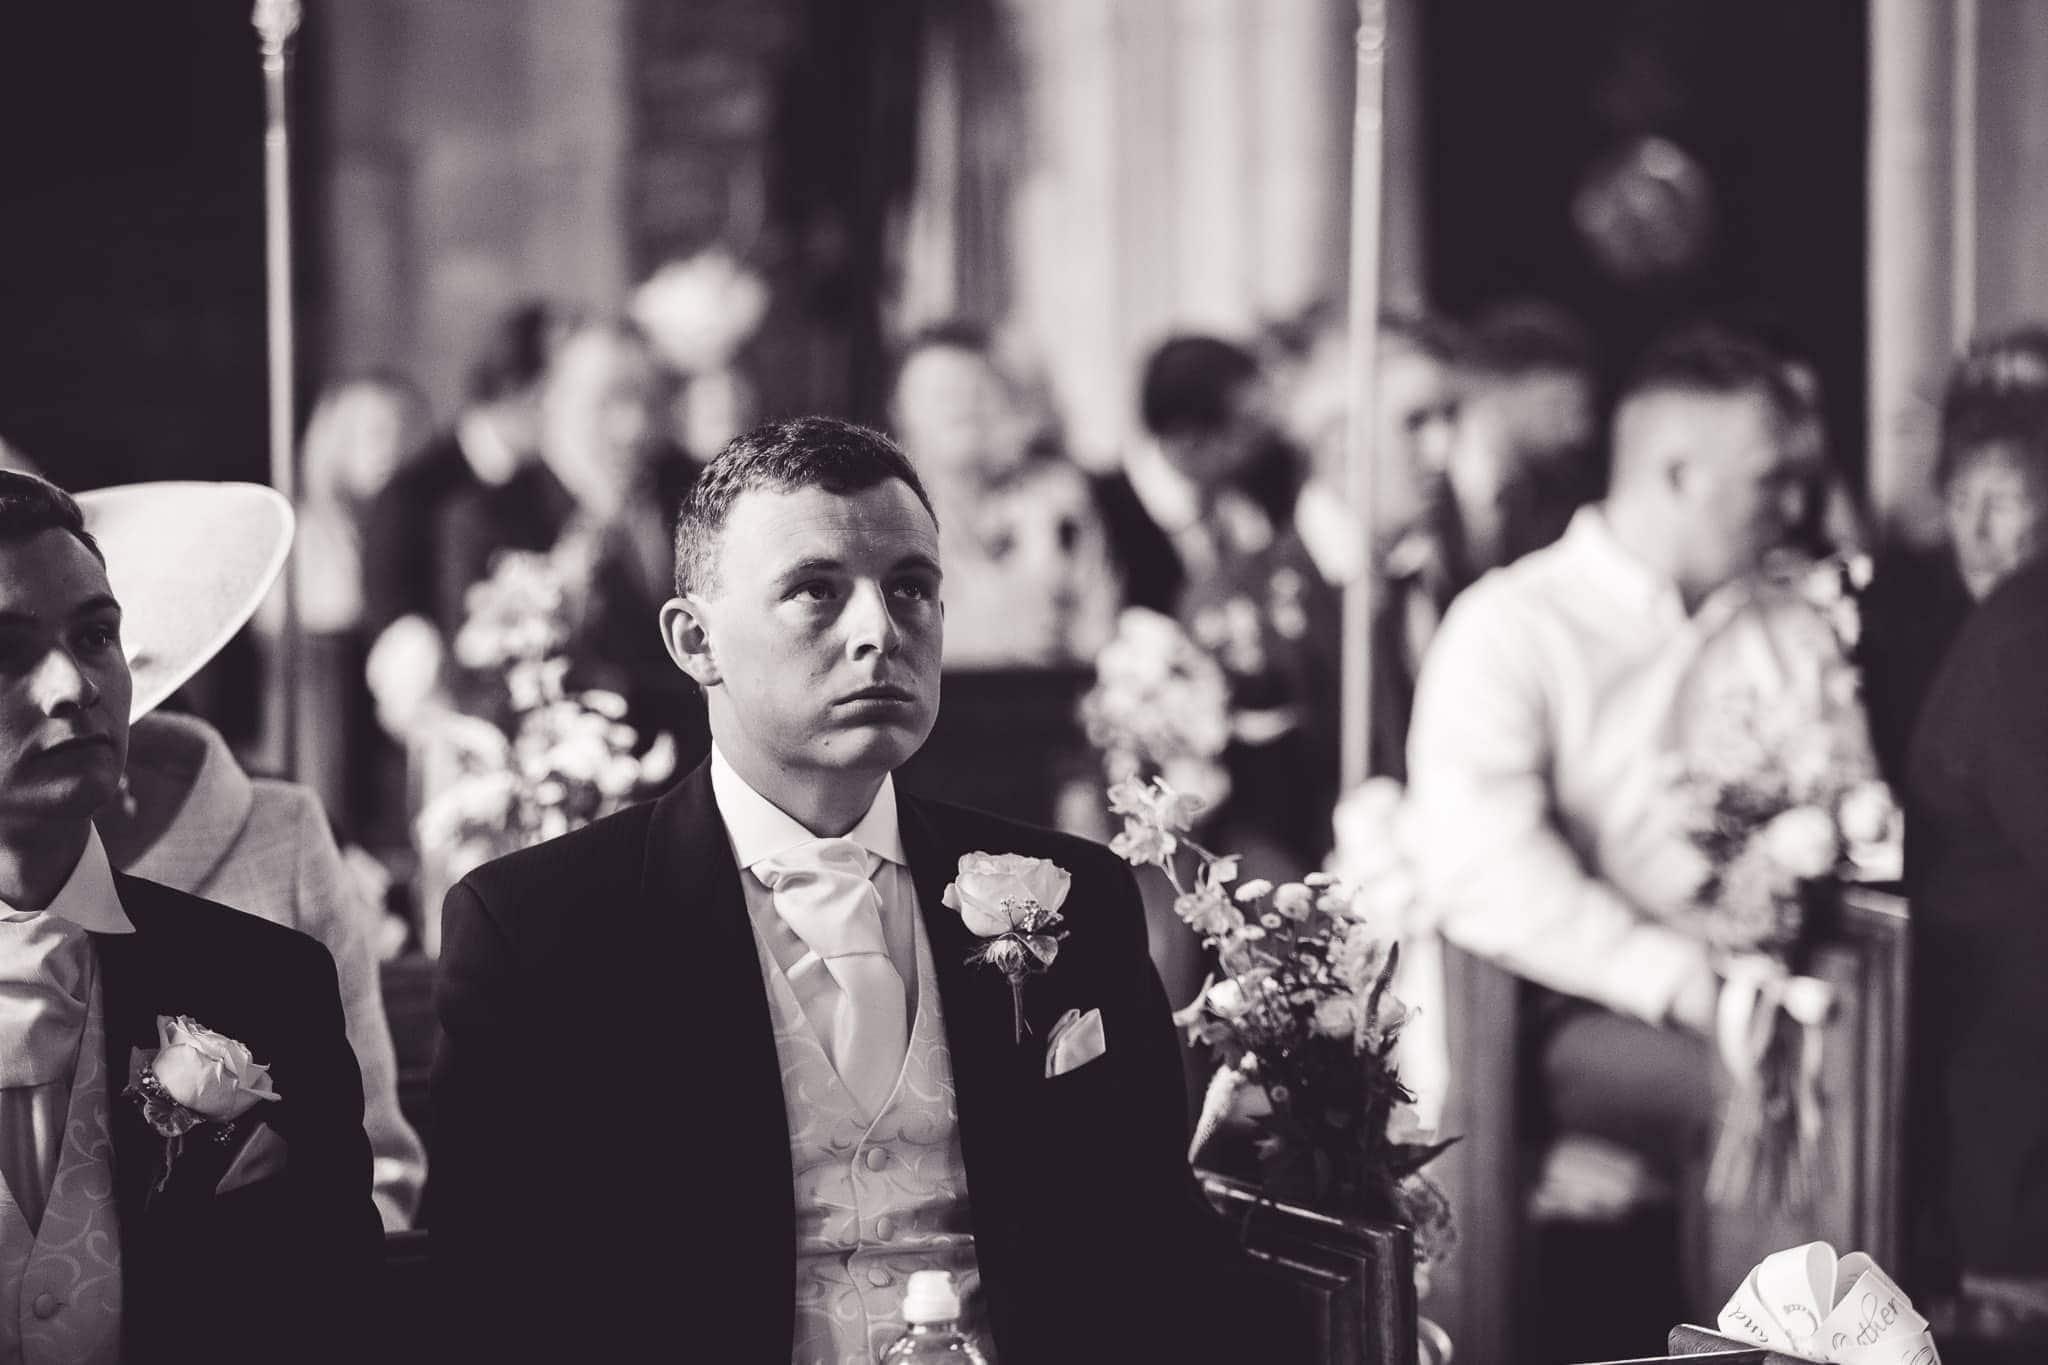 Catherine-George-Wedding-Cannington-Bridgwater-Somerset-Katie-Mortimore-Photography-small-121